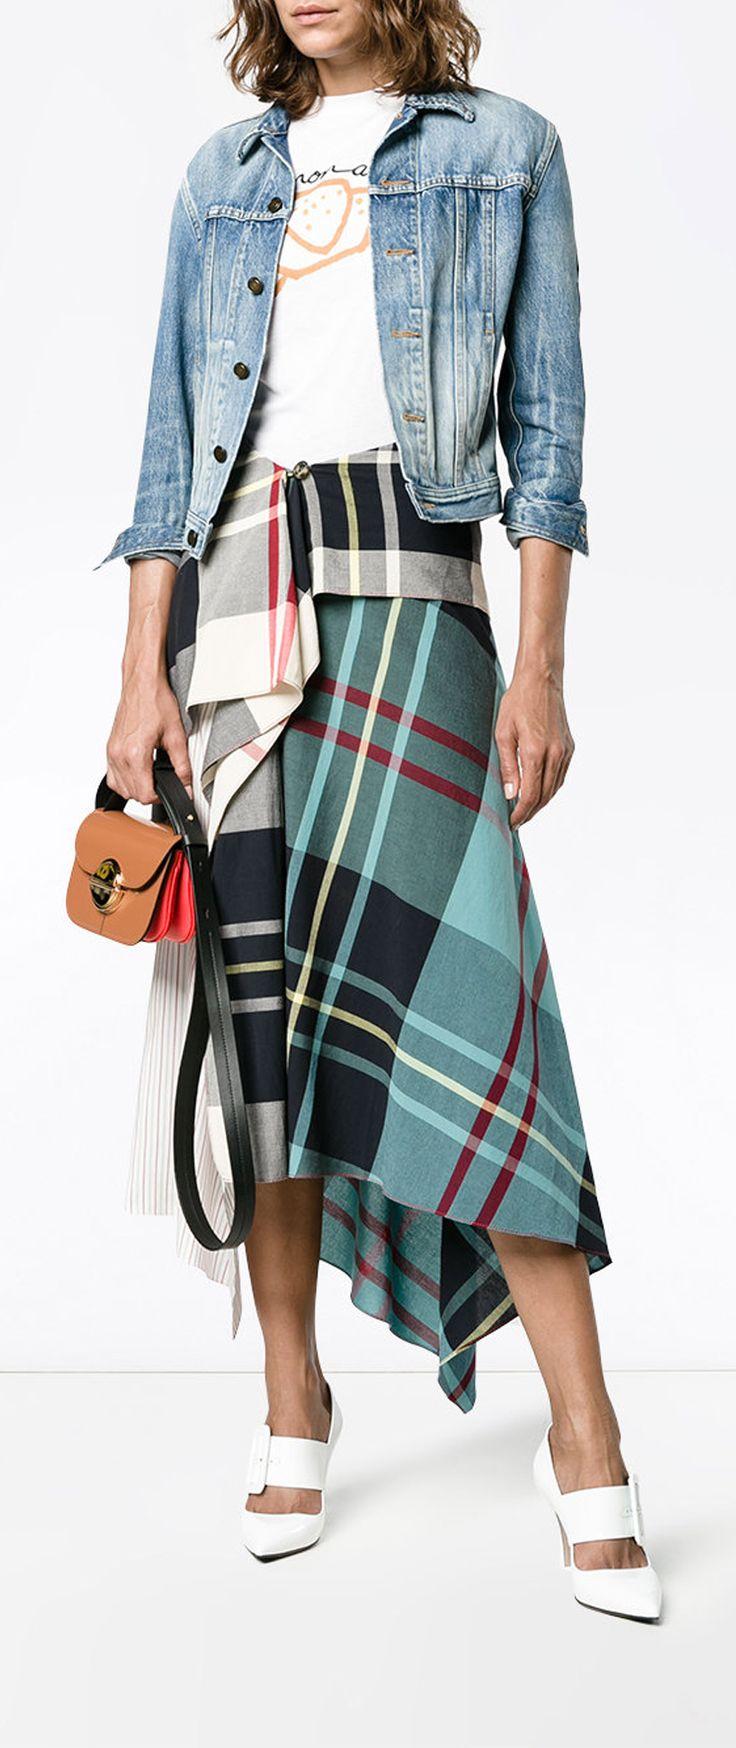 J.W.ANDERSON Tartan Asymmetric High Waisted Skirt, explore new season J.W.Anderson on Farfetch now.